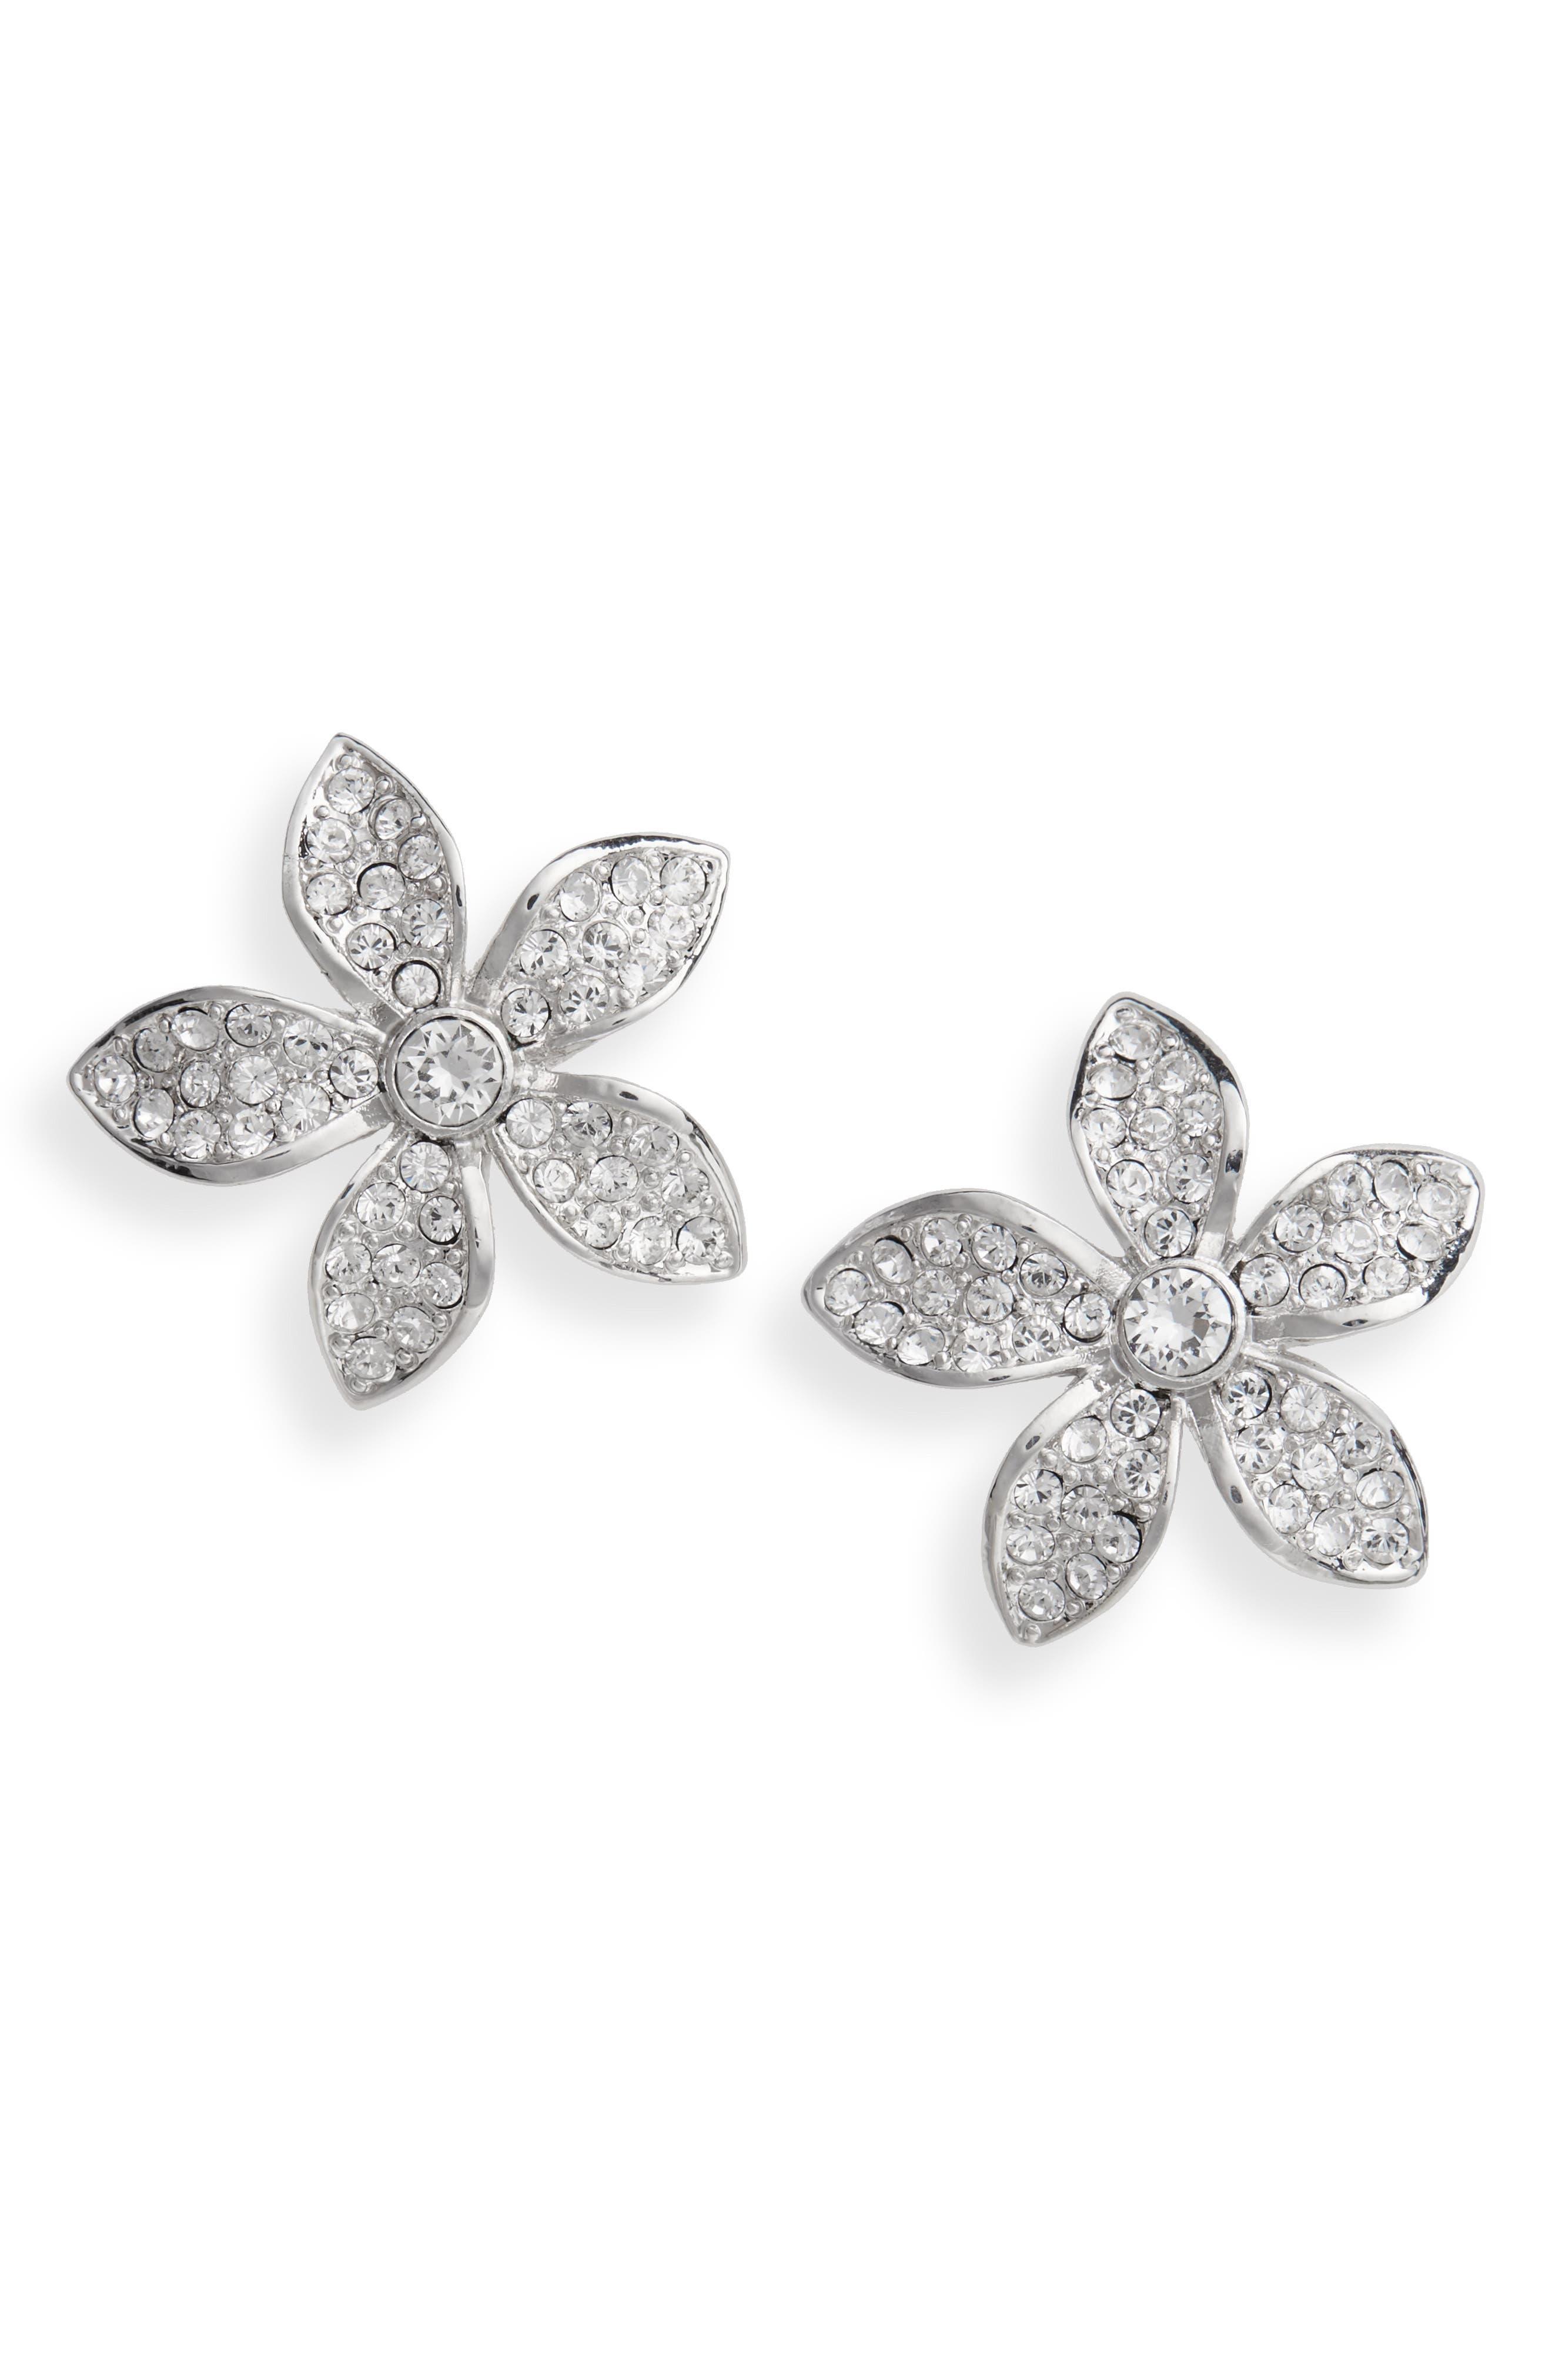 Floral Crystal Stud Earrings,                             Main thumbnail 1, color,                             042